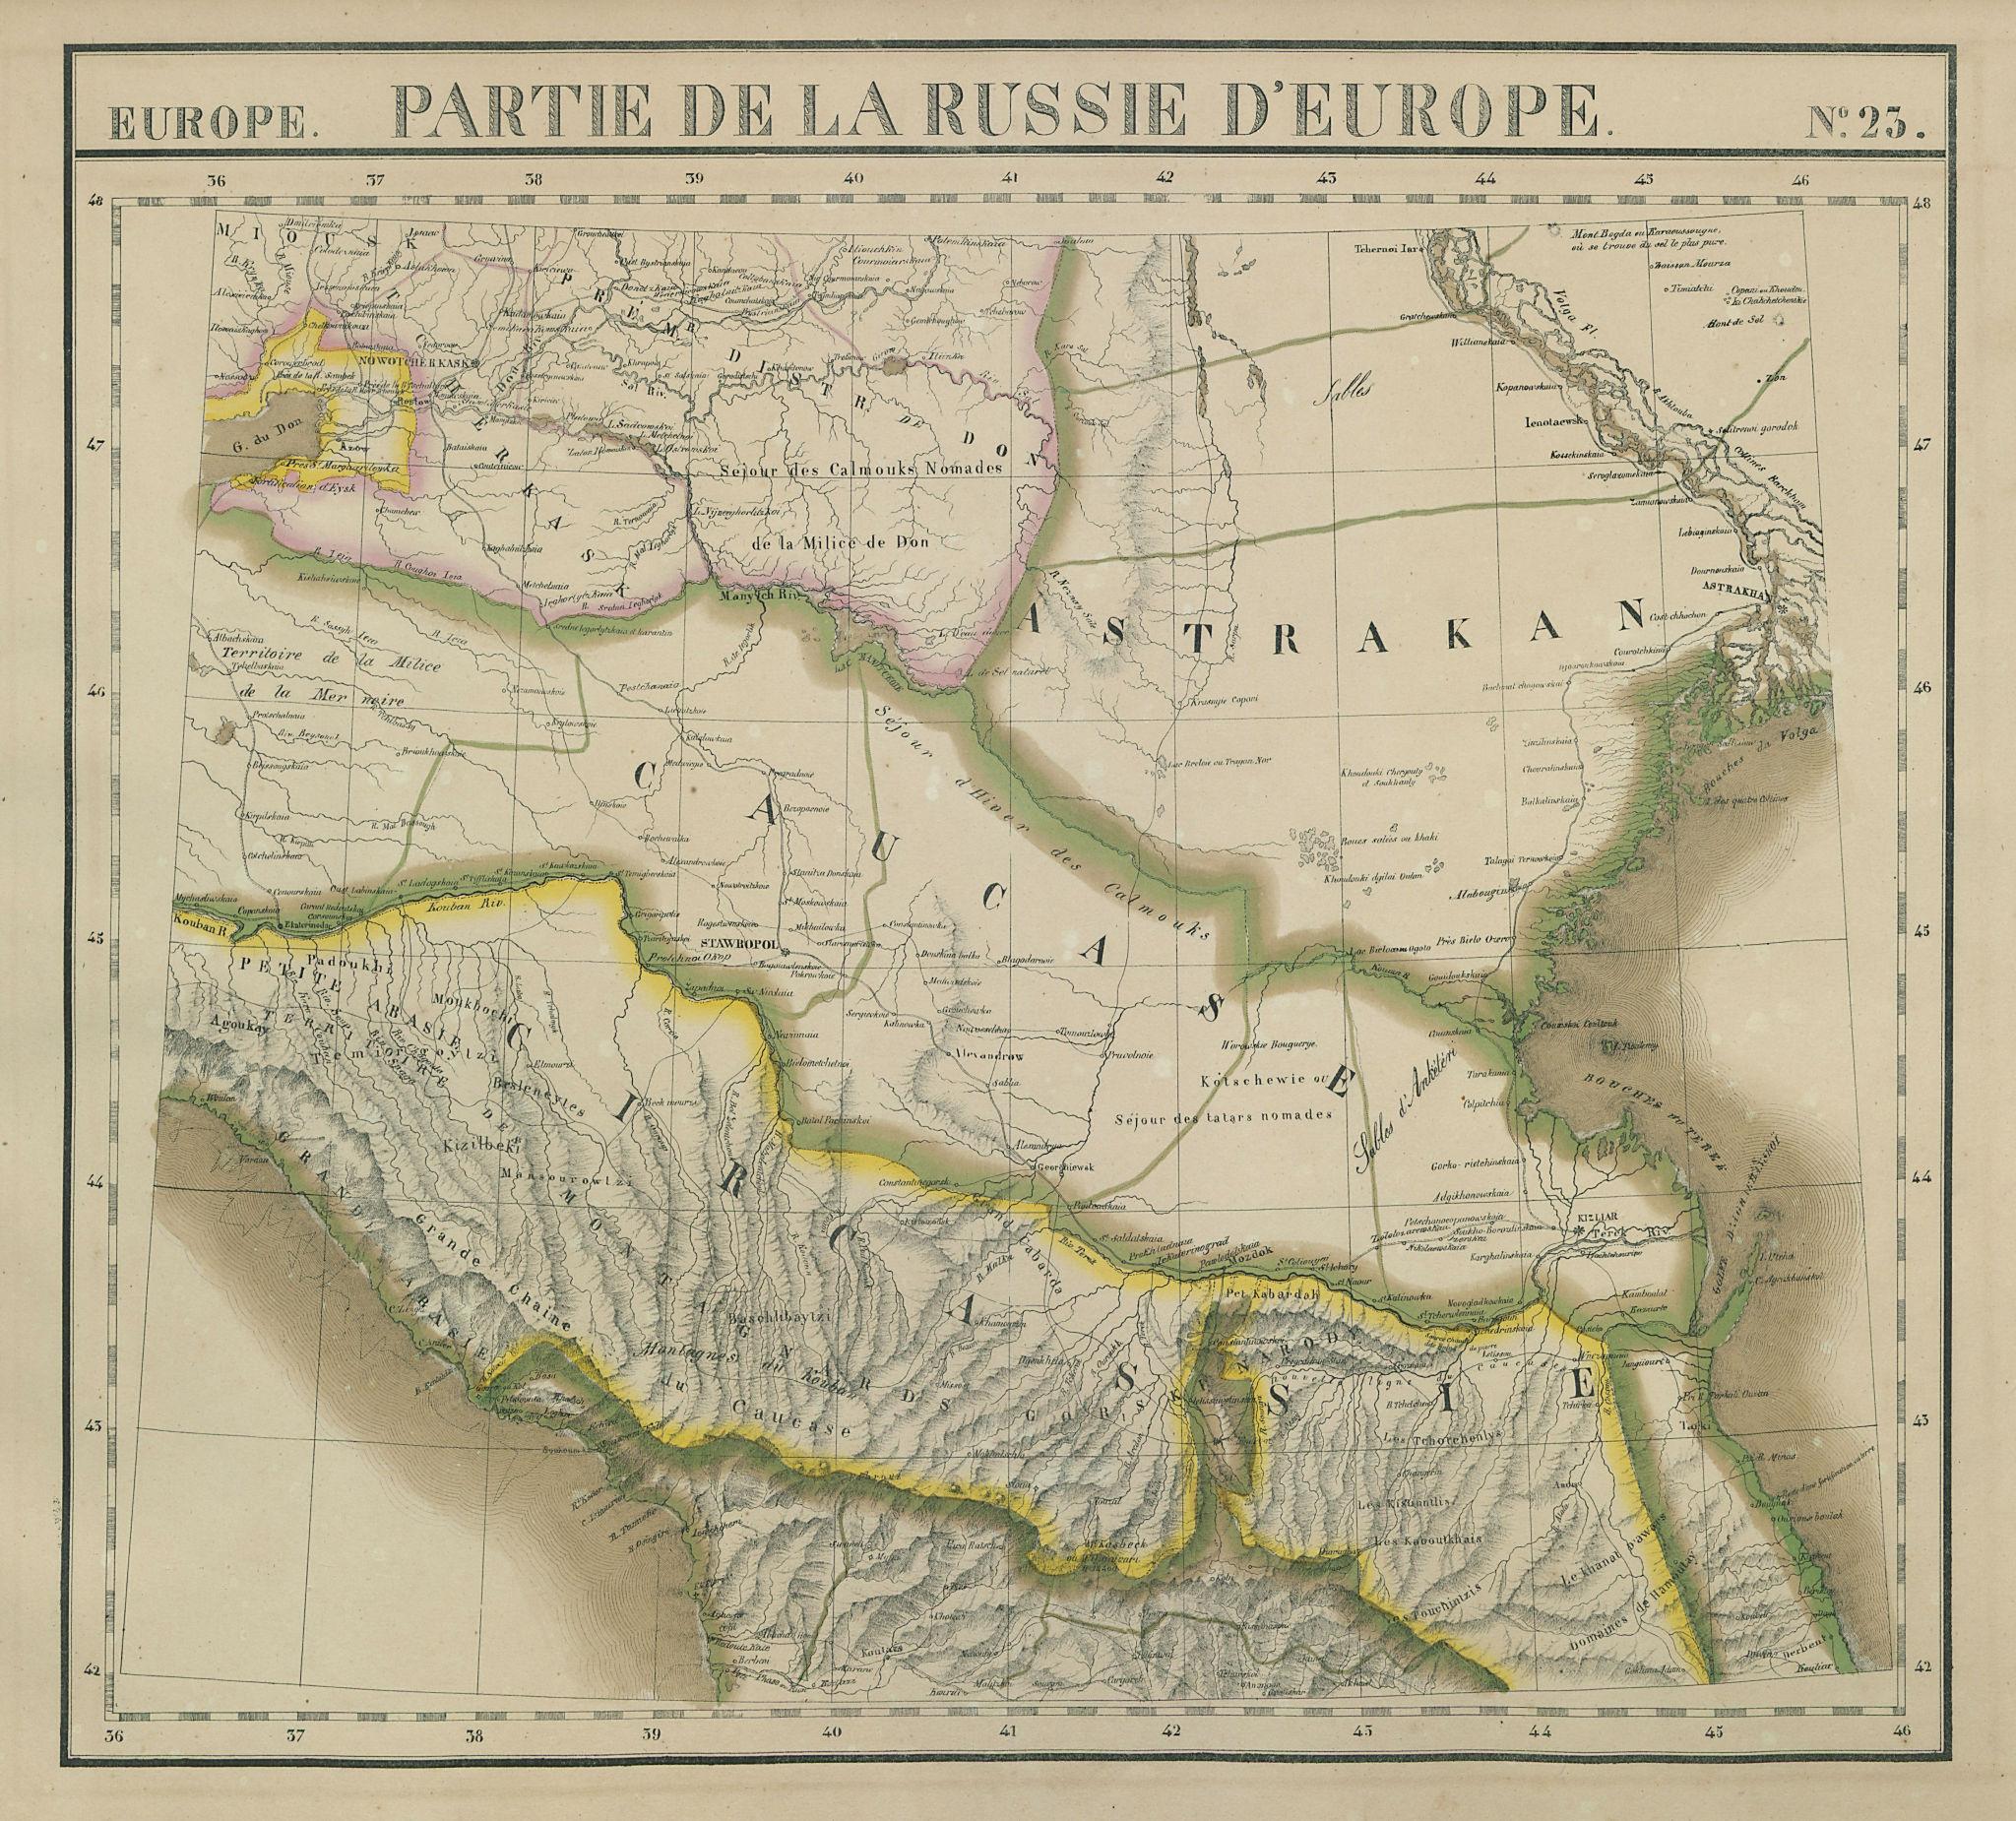 Russie d'Europe #23 North Caucasus Russia Georgia VANDERMAELEN 1827 old map